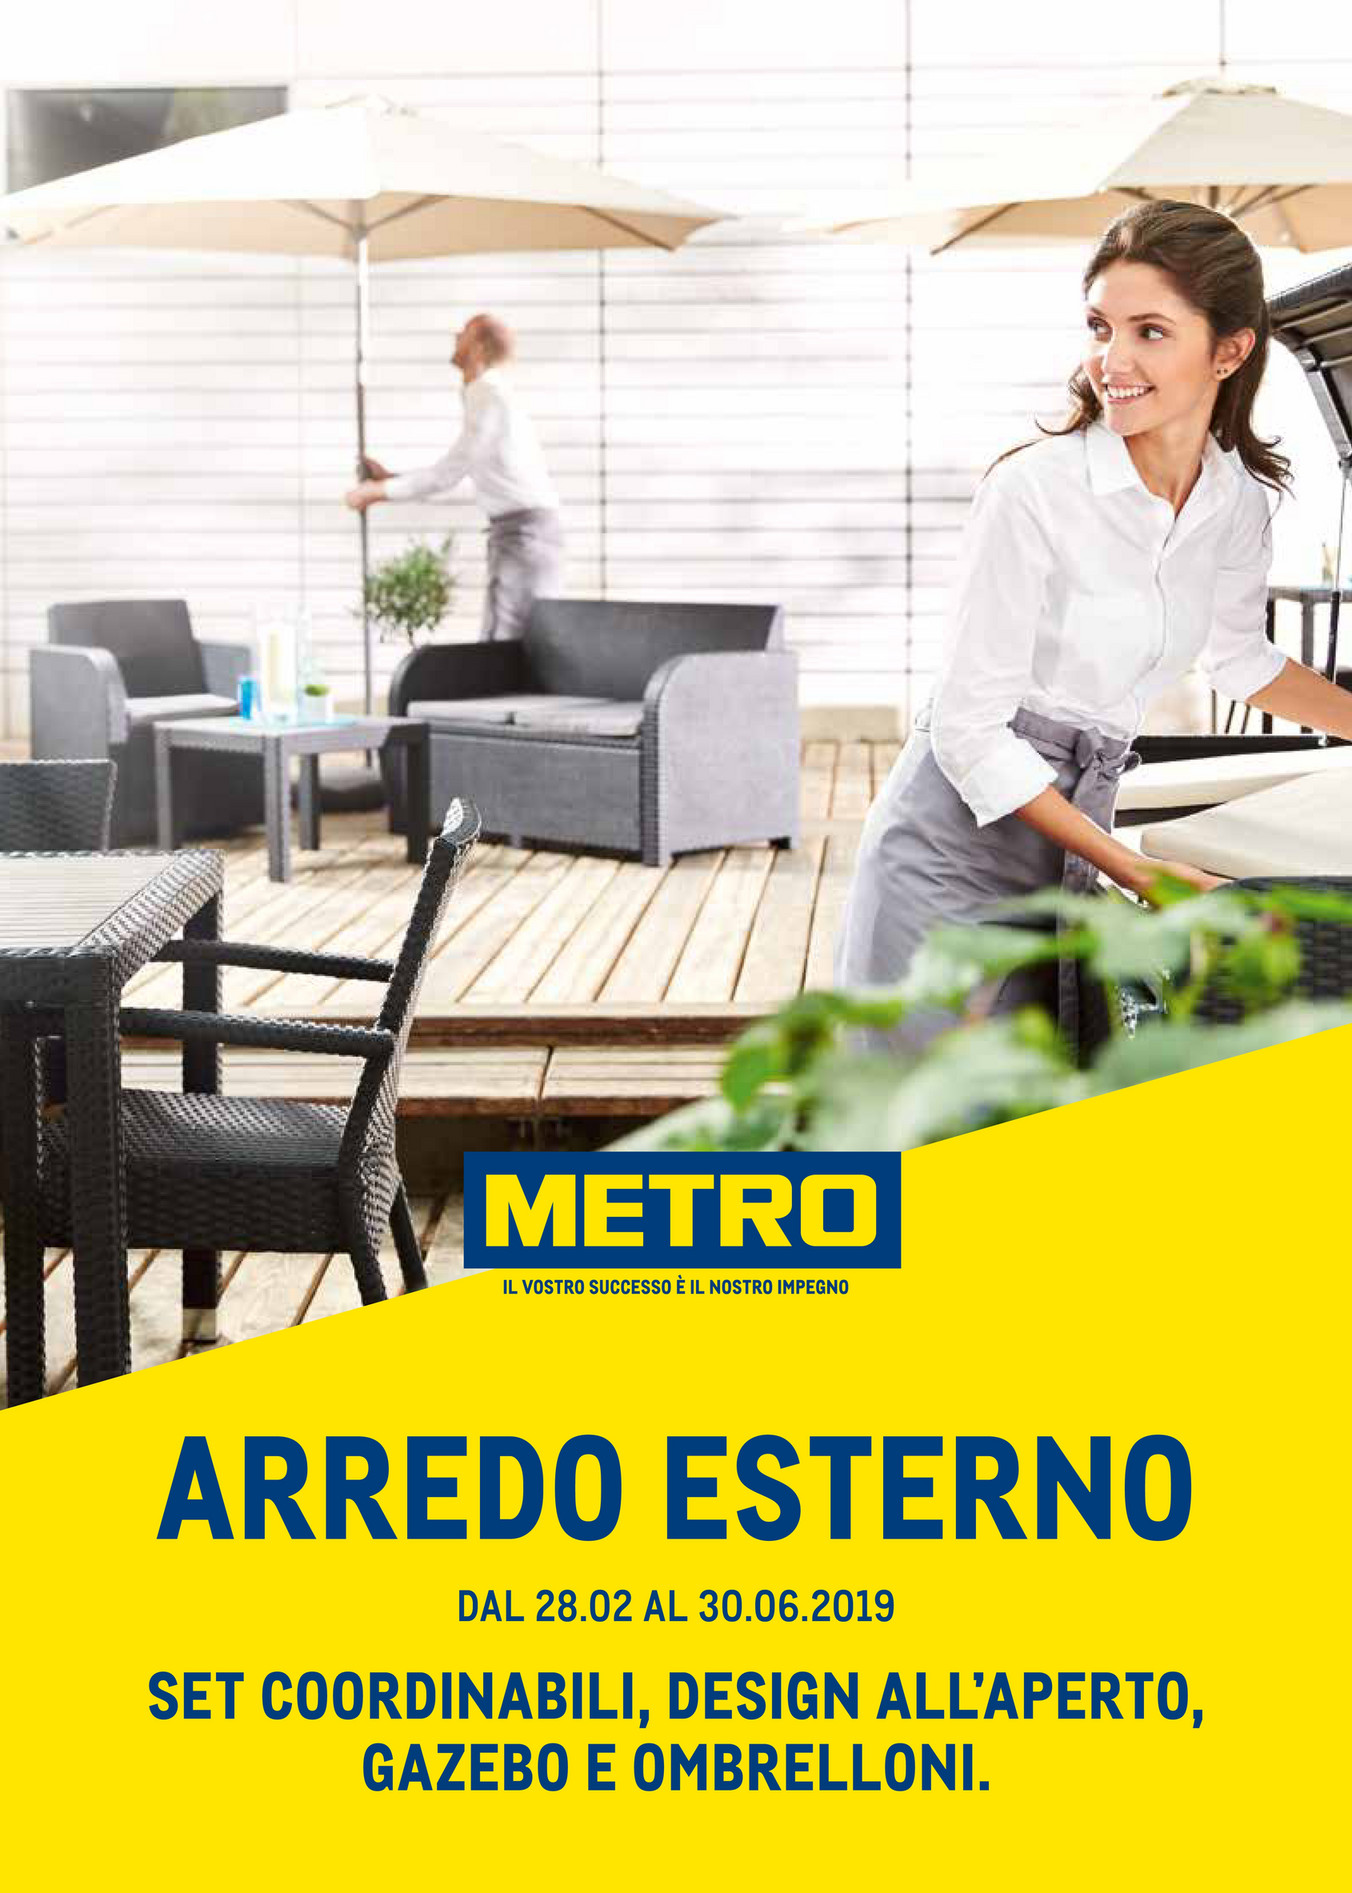 Maxi cc arredo esterno metro trento 2019 pagina 1 for Arredo esterno